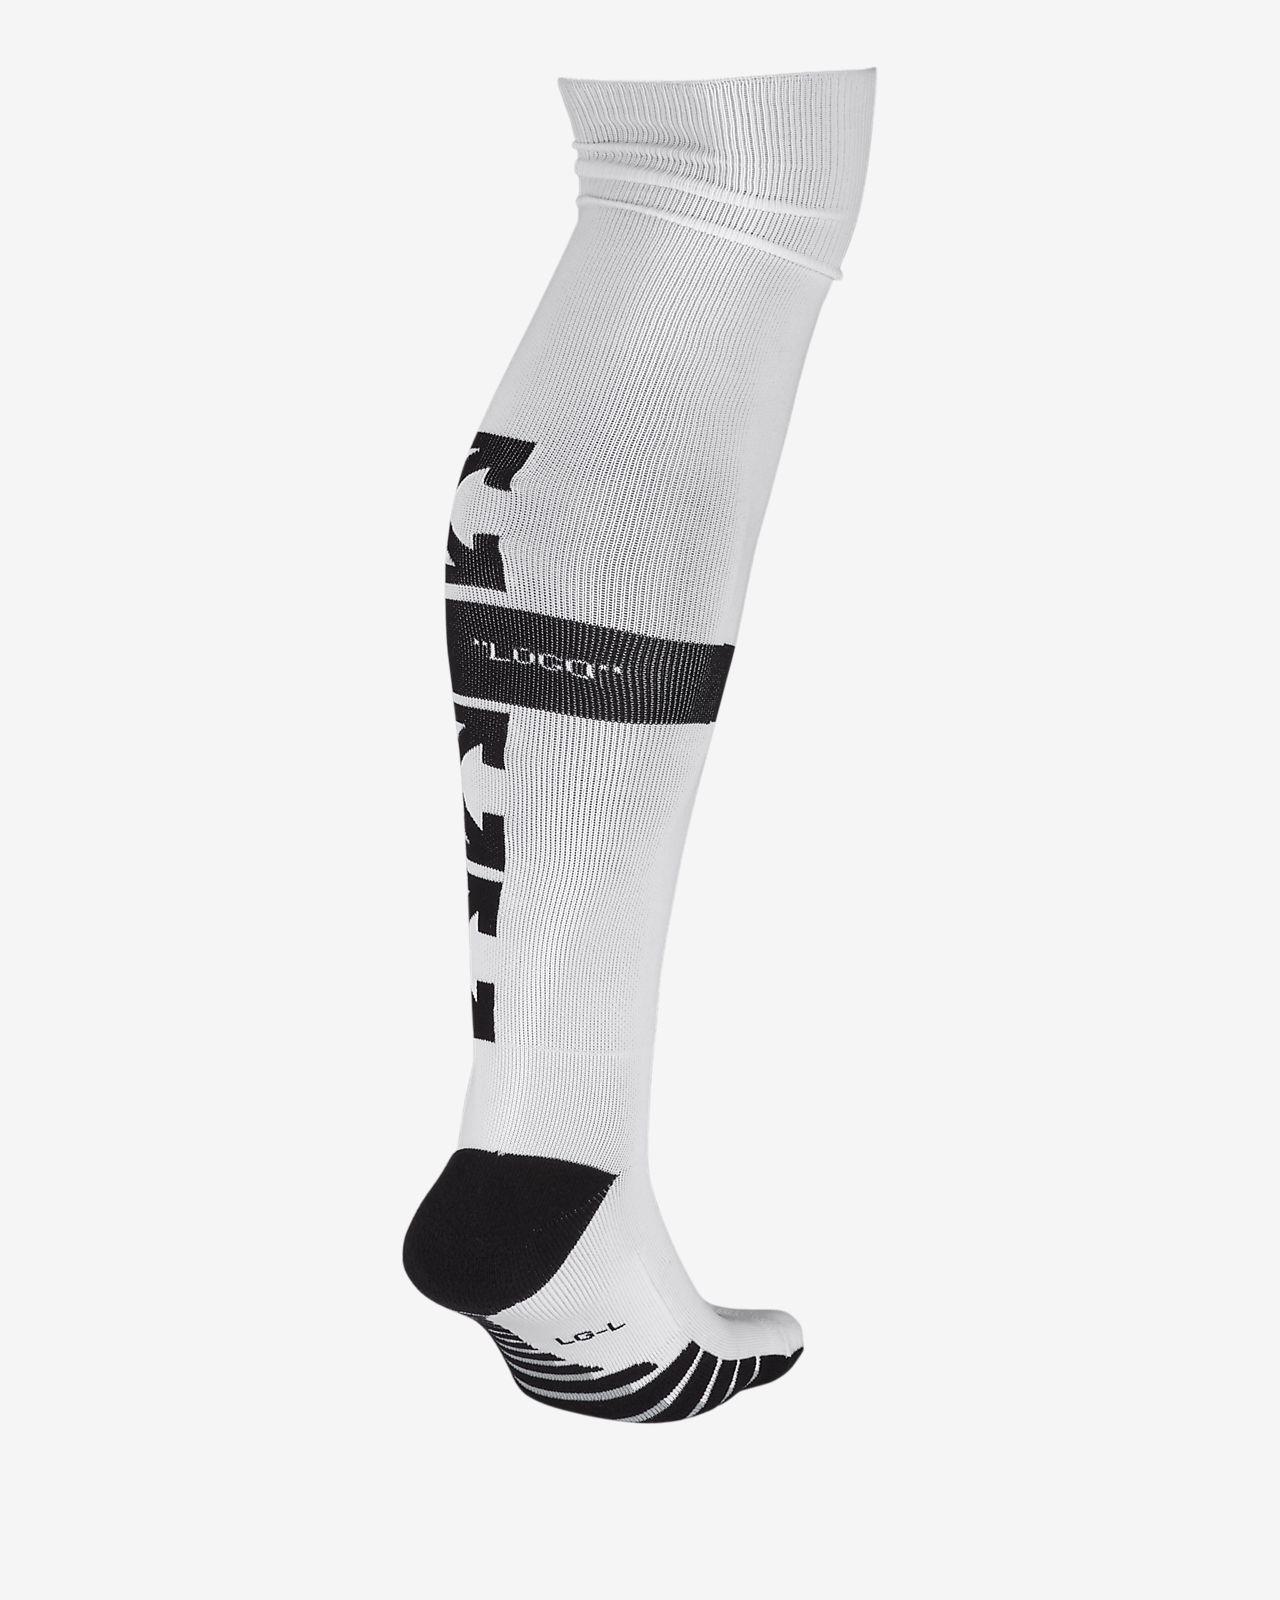 3903923a4717 Nike x Off-White Football Socks. Nike.com ZA